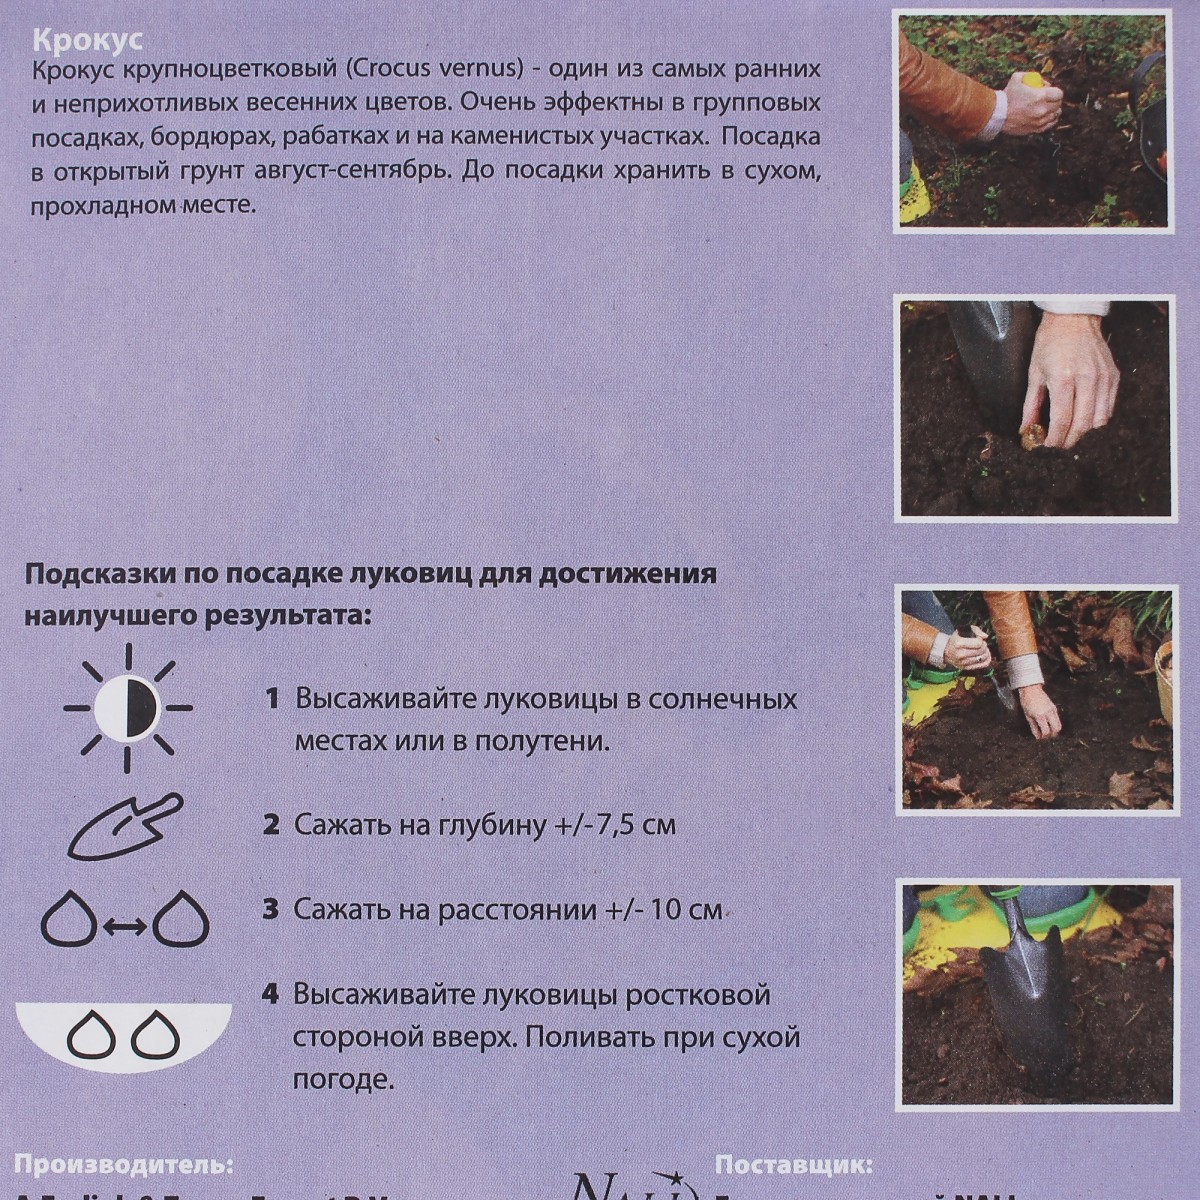 Крокус Крокус Кочи Размер Луковицы 9/10